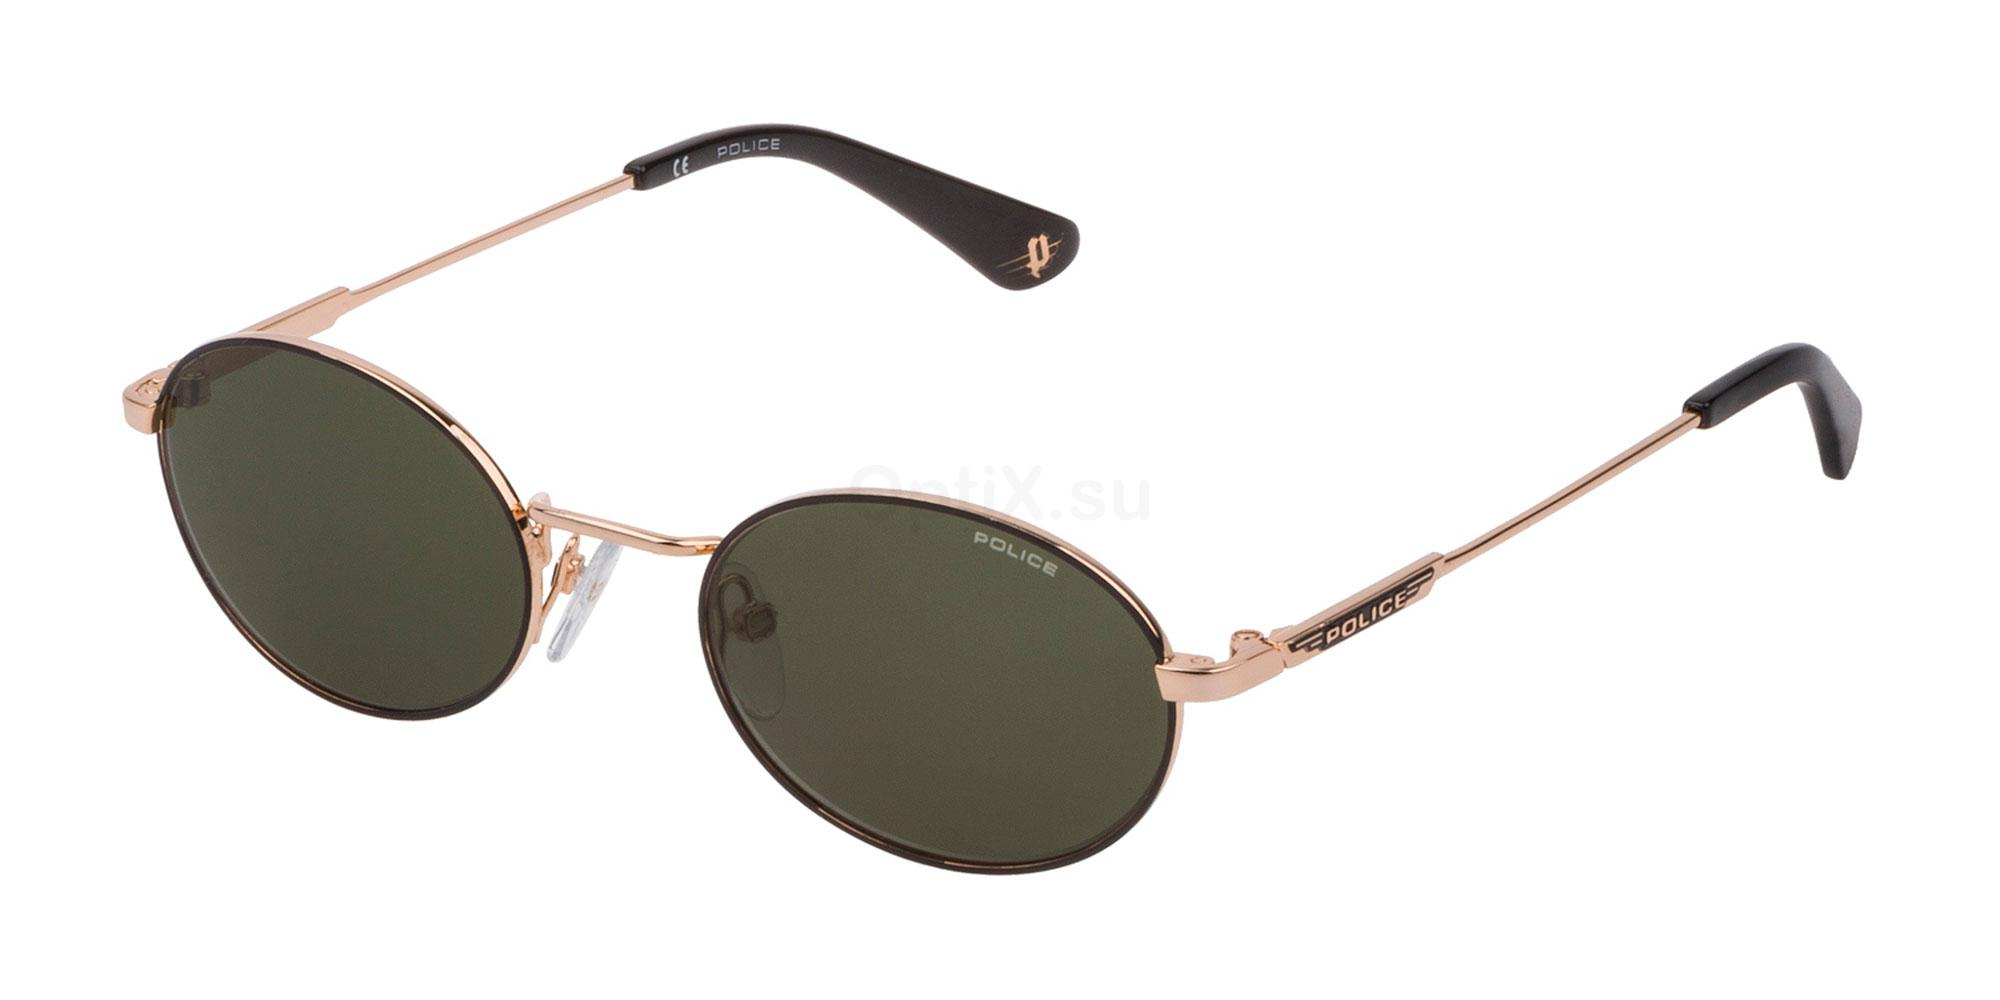 0301 SK557 Sunglasses, Police Kids